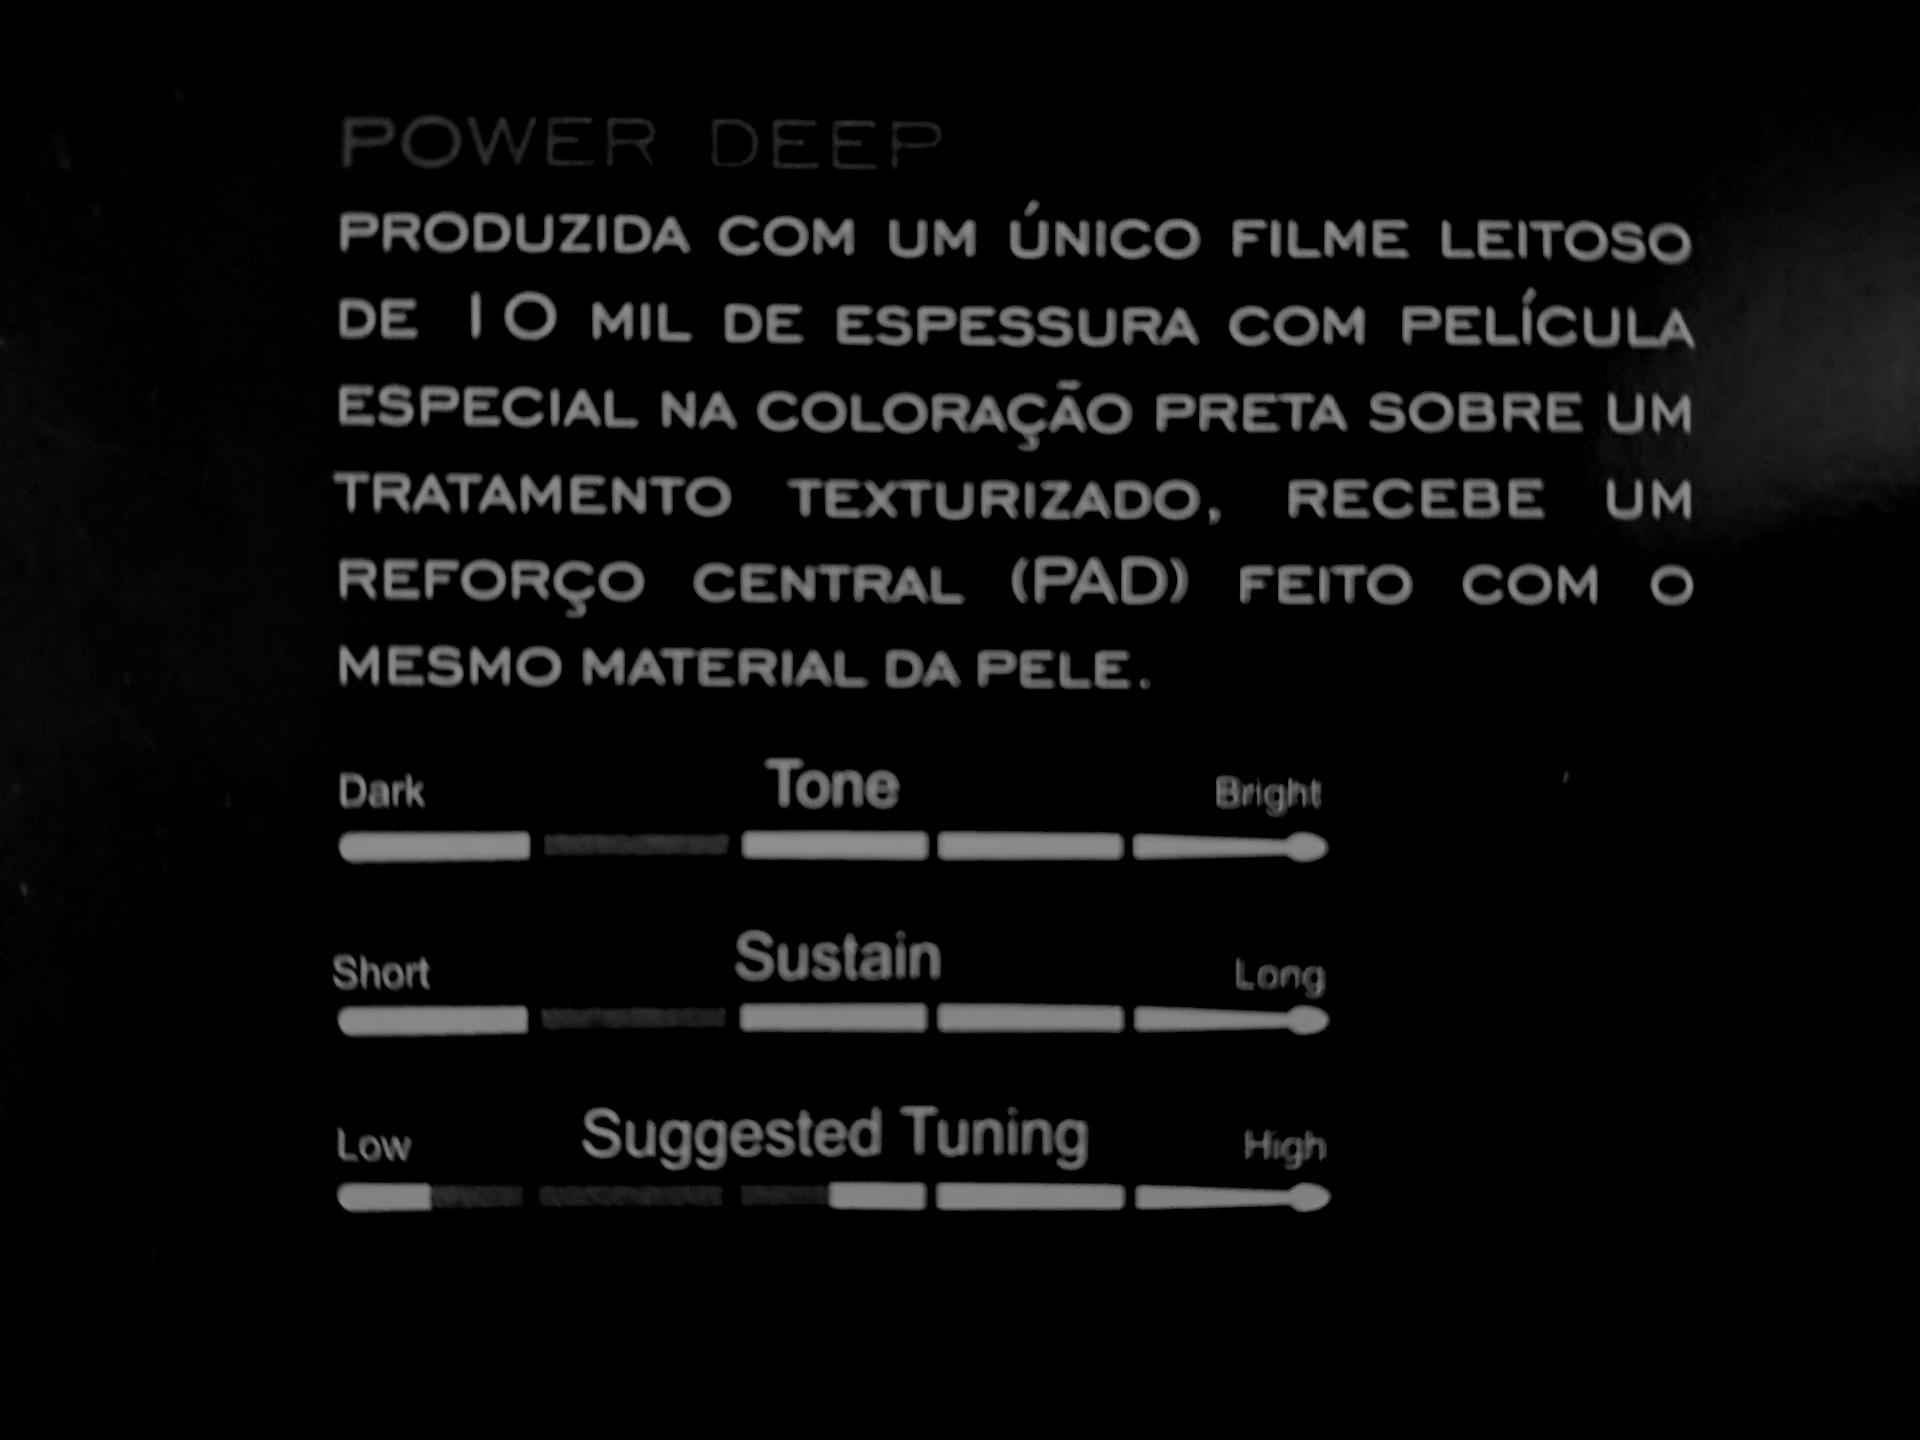 "Pele texturizada POWER DEEP C/ PAD 08"" Dudu Portes, LUEN."